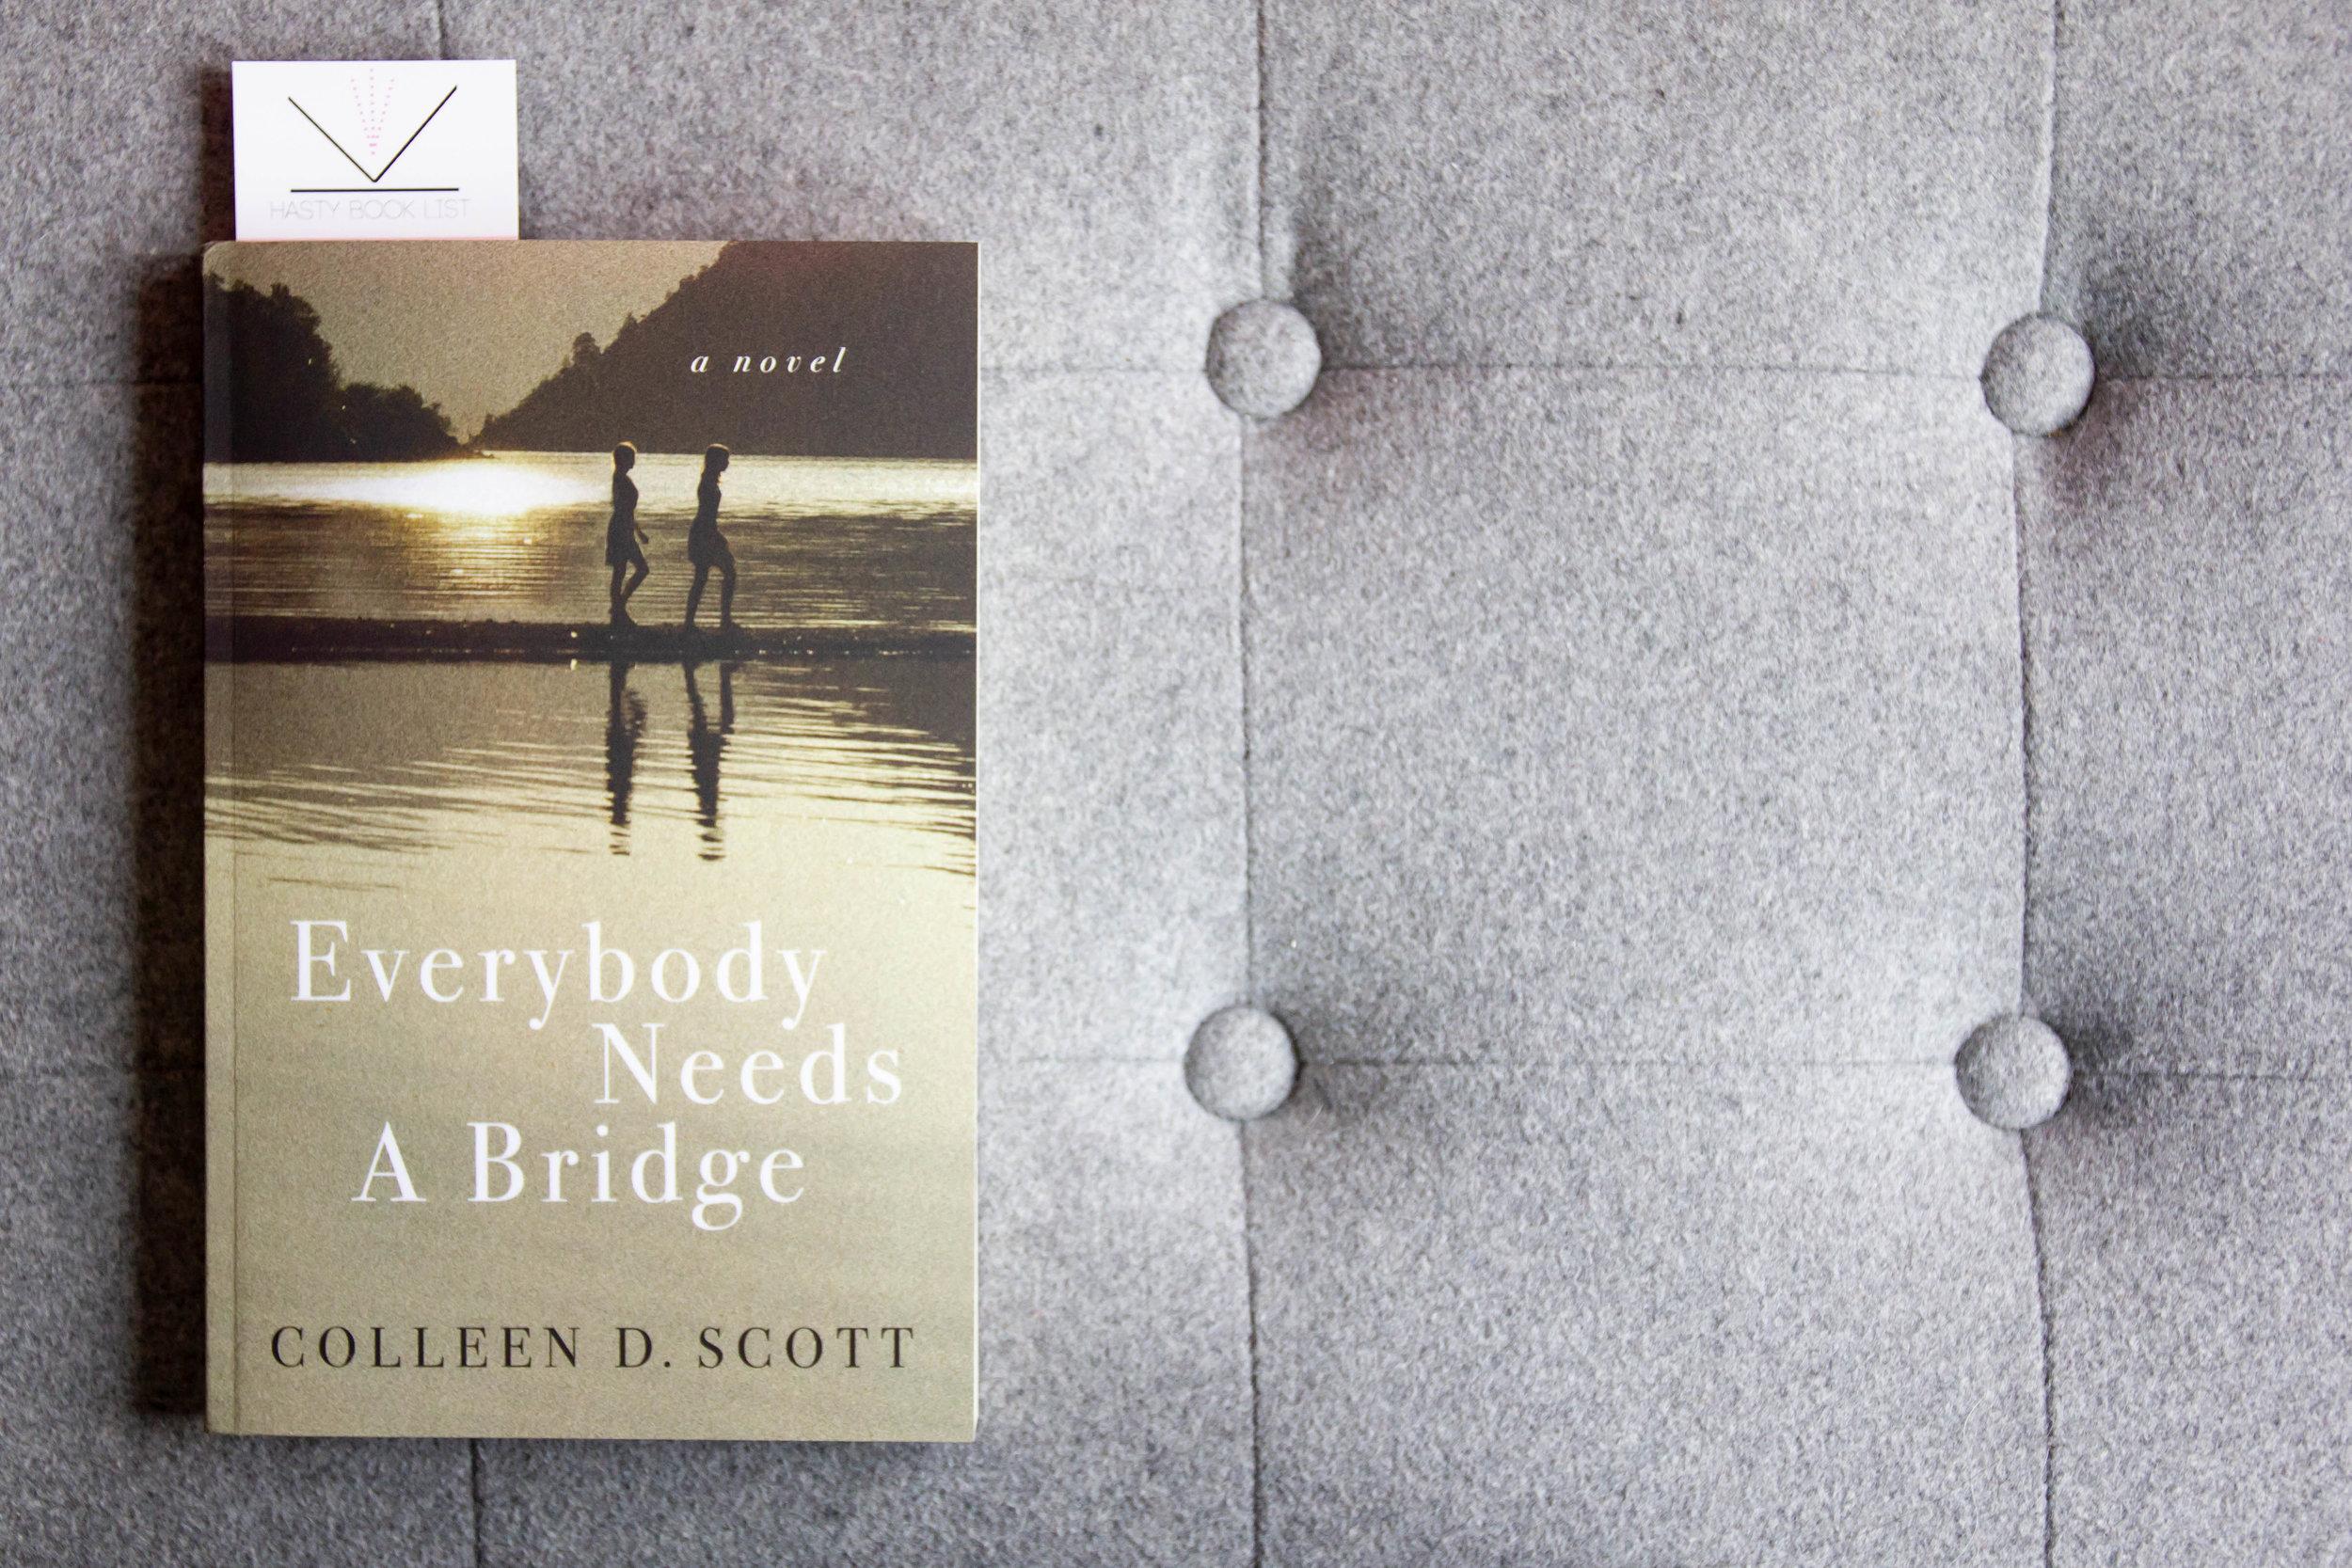 Book Feature - Everybody Needs a Bridge by Colleen D. Scott